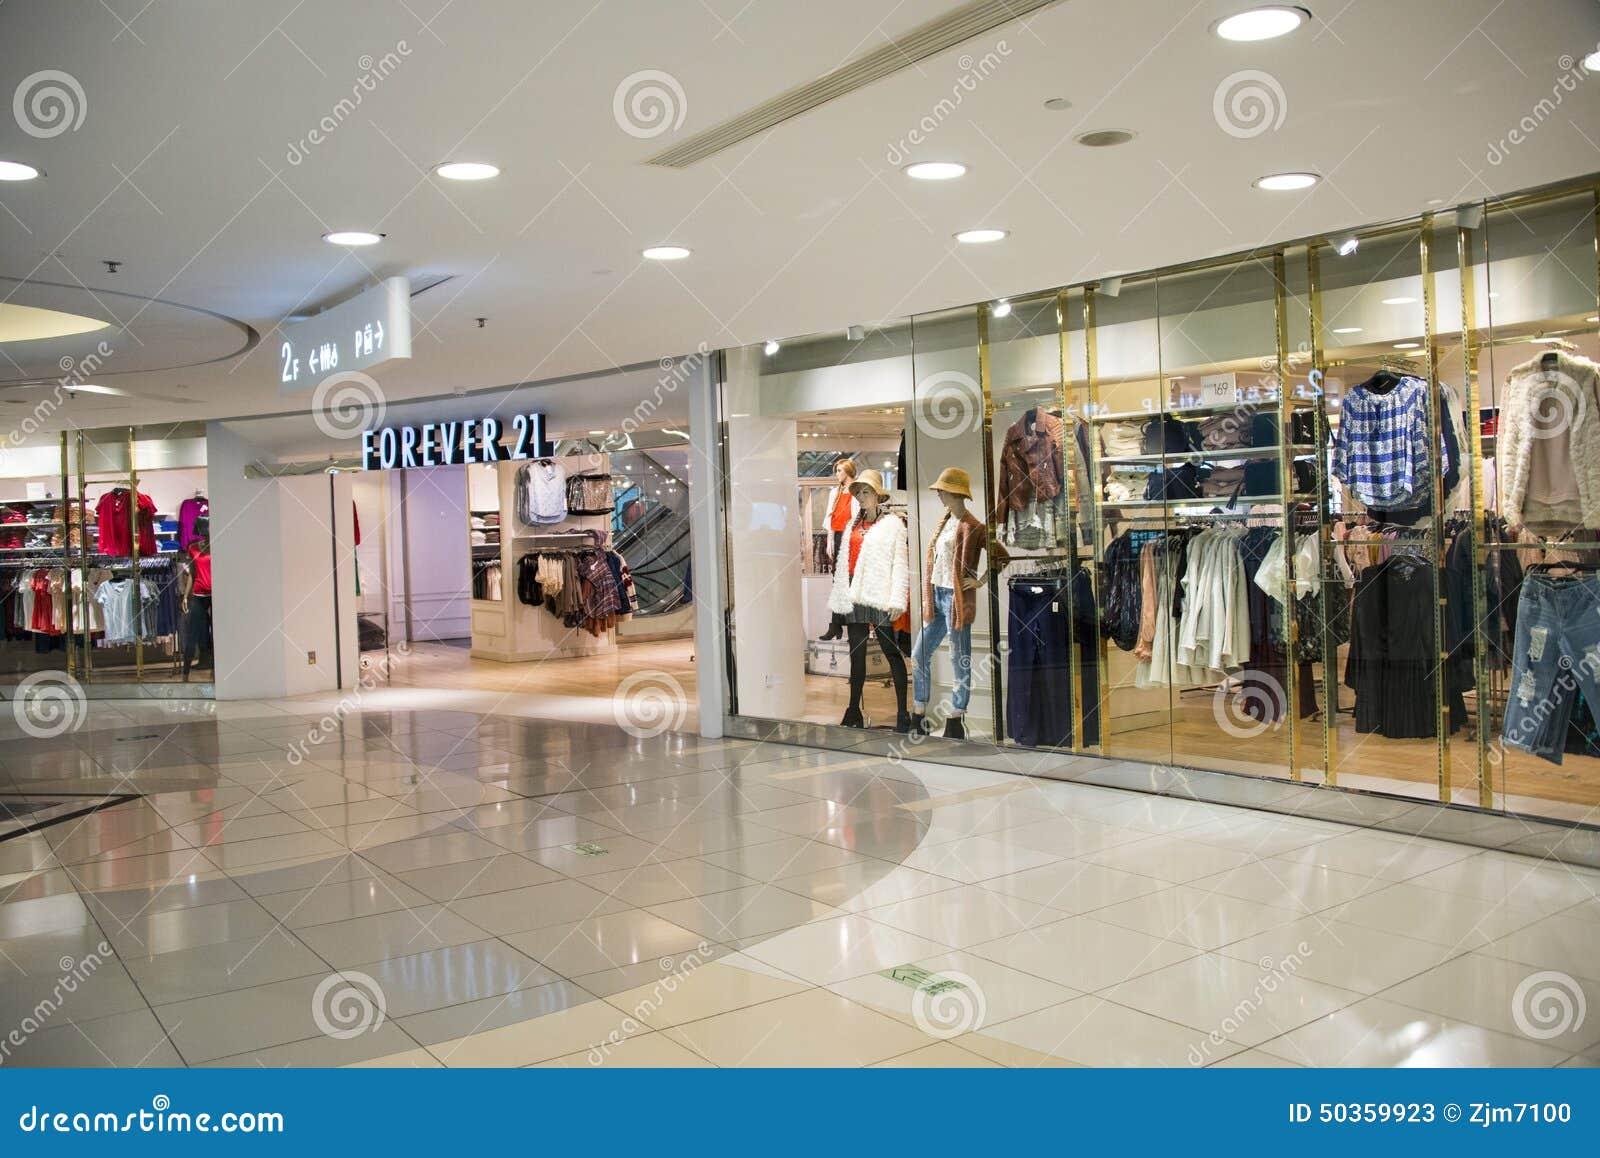 La fashion clothing store